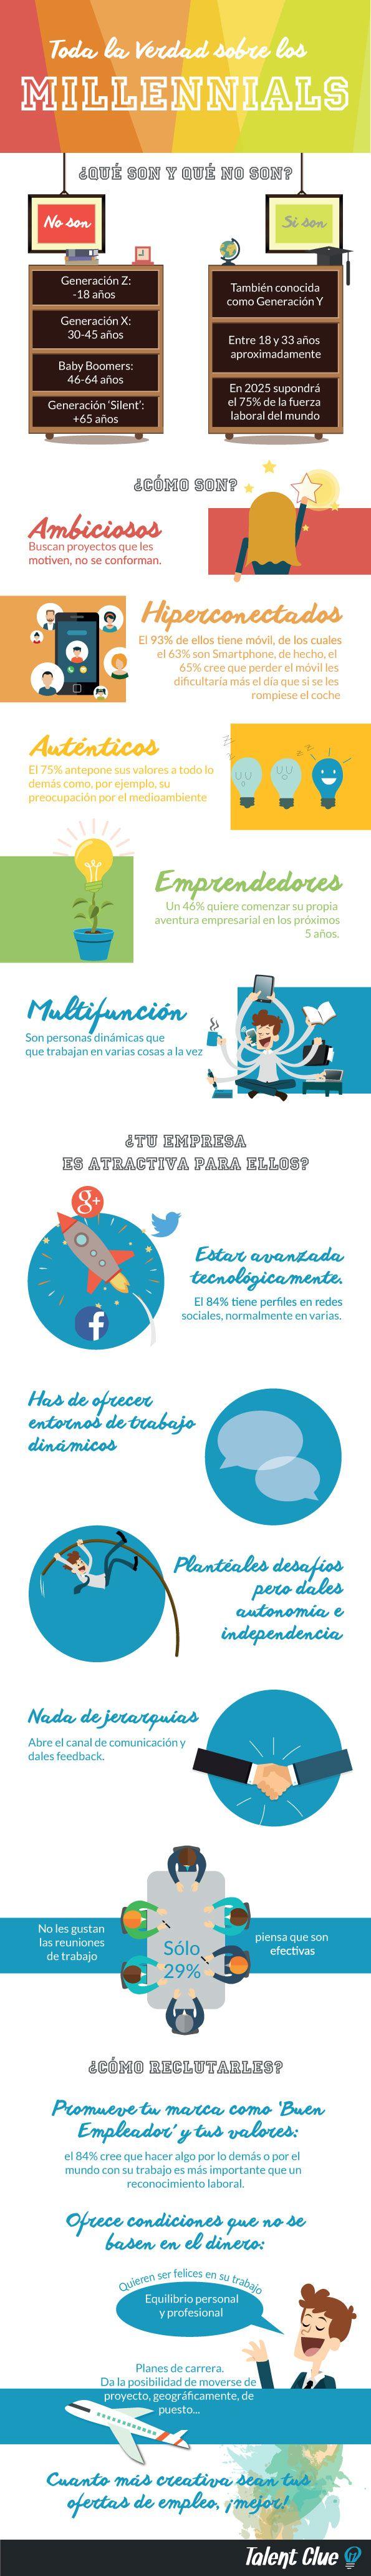 millenials-infografia